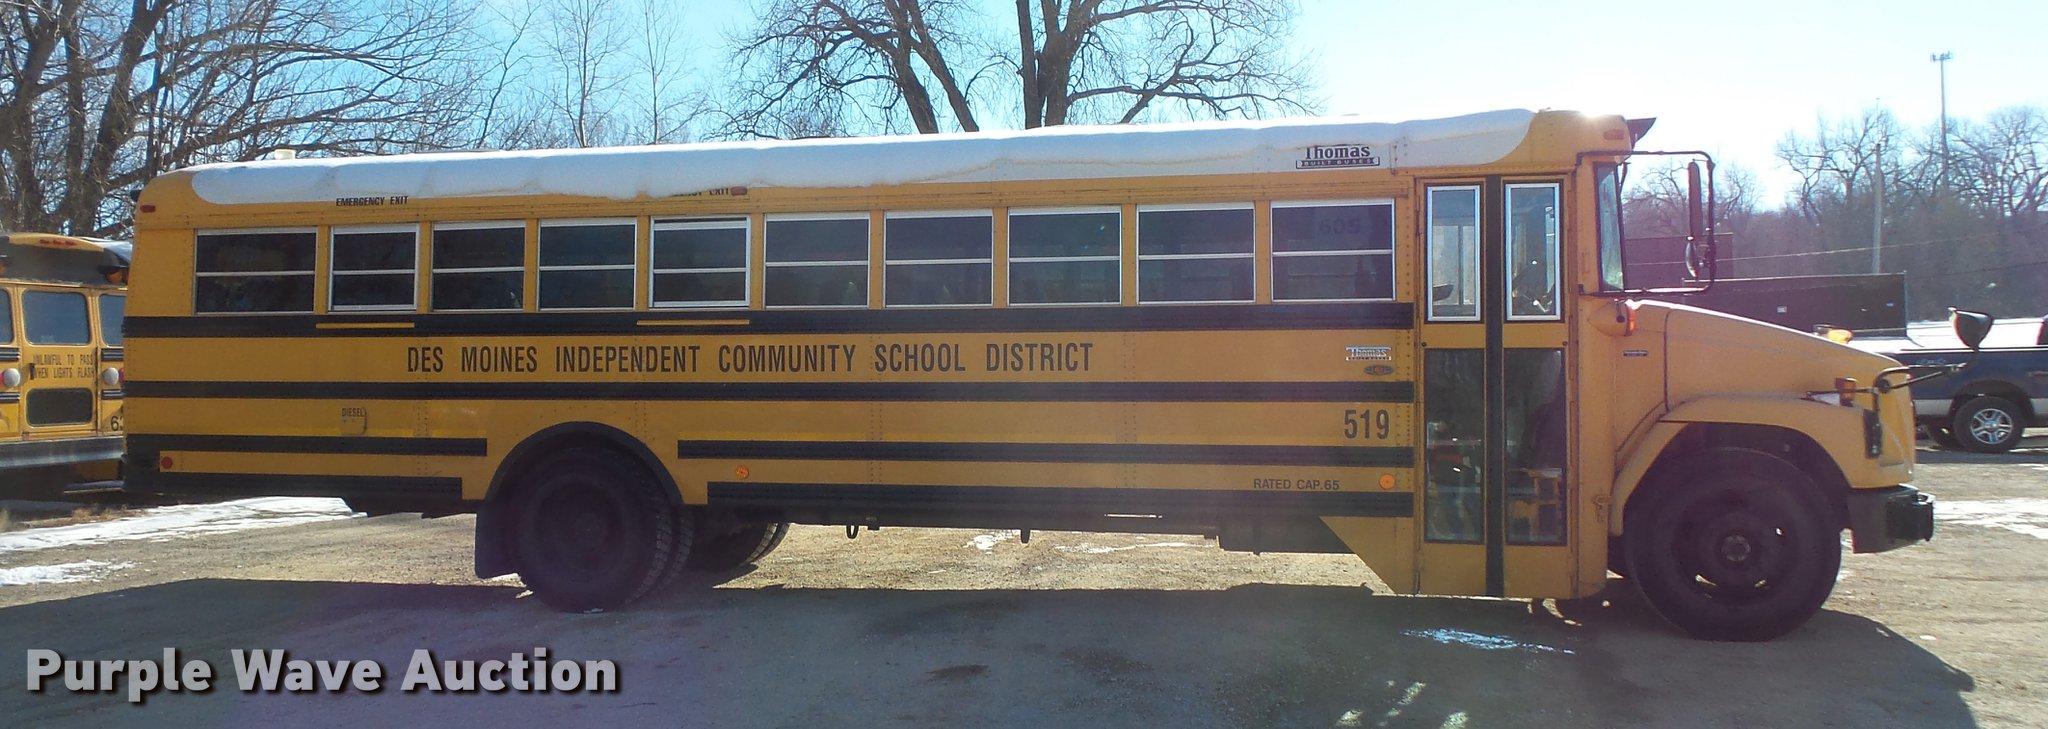 Thomas Bus Diagram Trusted Wiring Diagrams 2004 Built U2022 School Engine Compartment